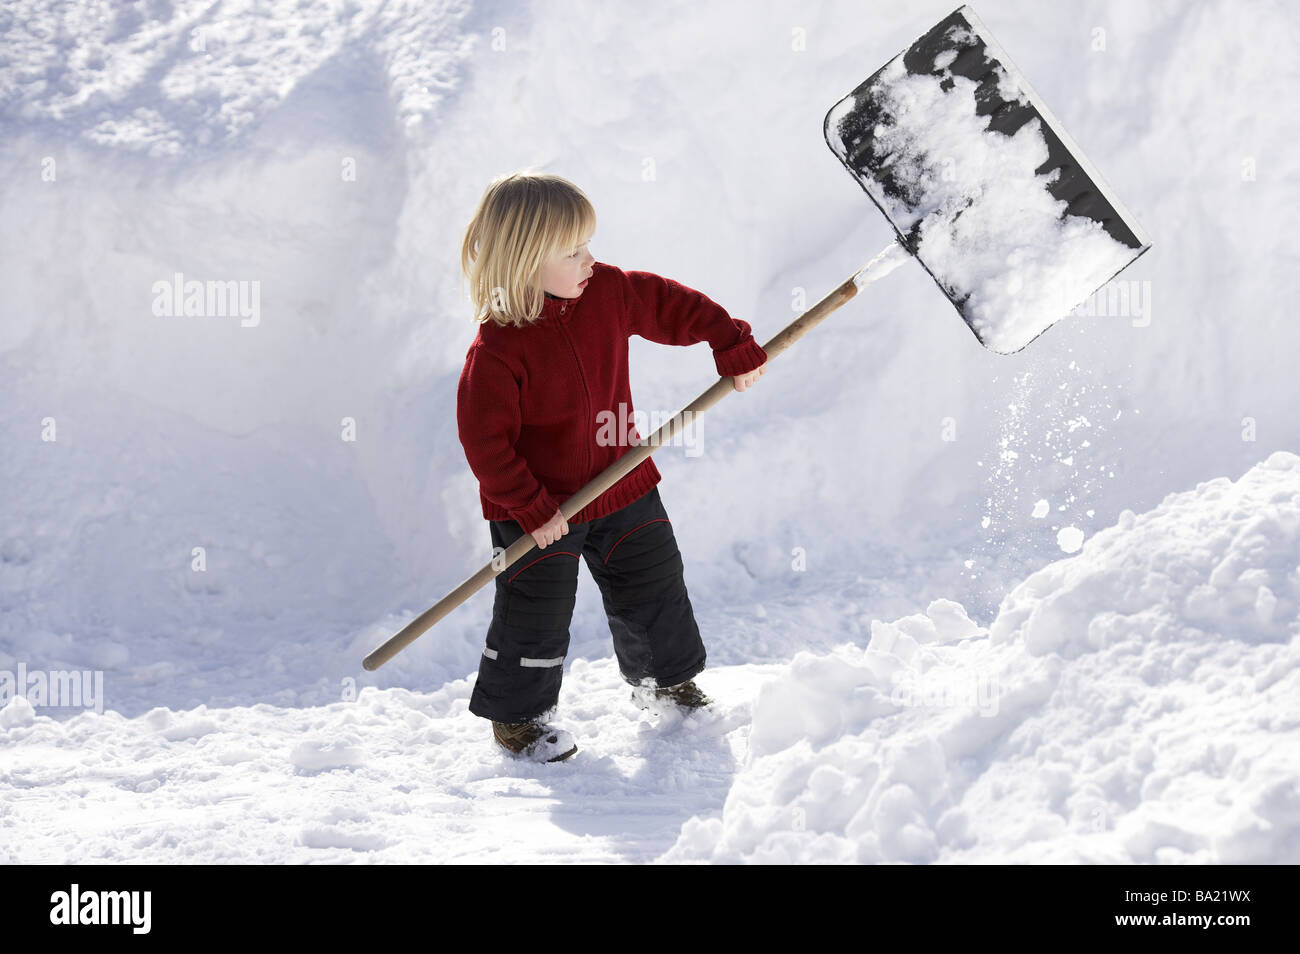 Give birth winter-clothing snow-shovels 4 years child blond ski-pants snow-shovel shovel holds shovels snow-evacuates - Stock Image